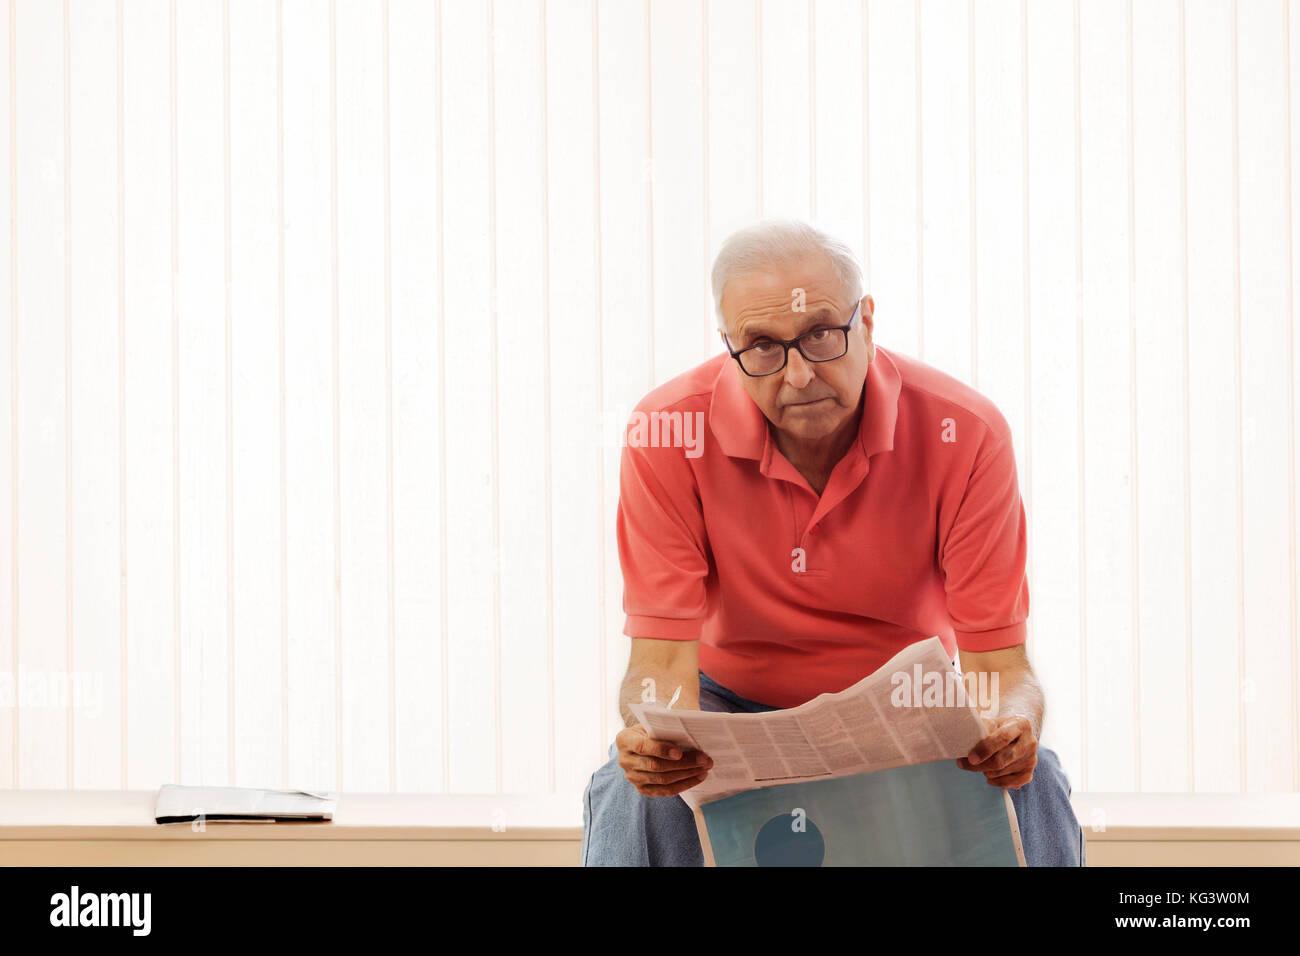 Senior Man reading newspaper sitting on bench at home - Stock Image